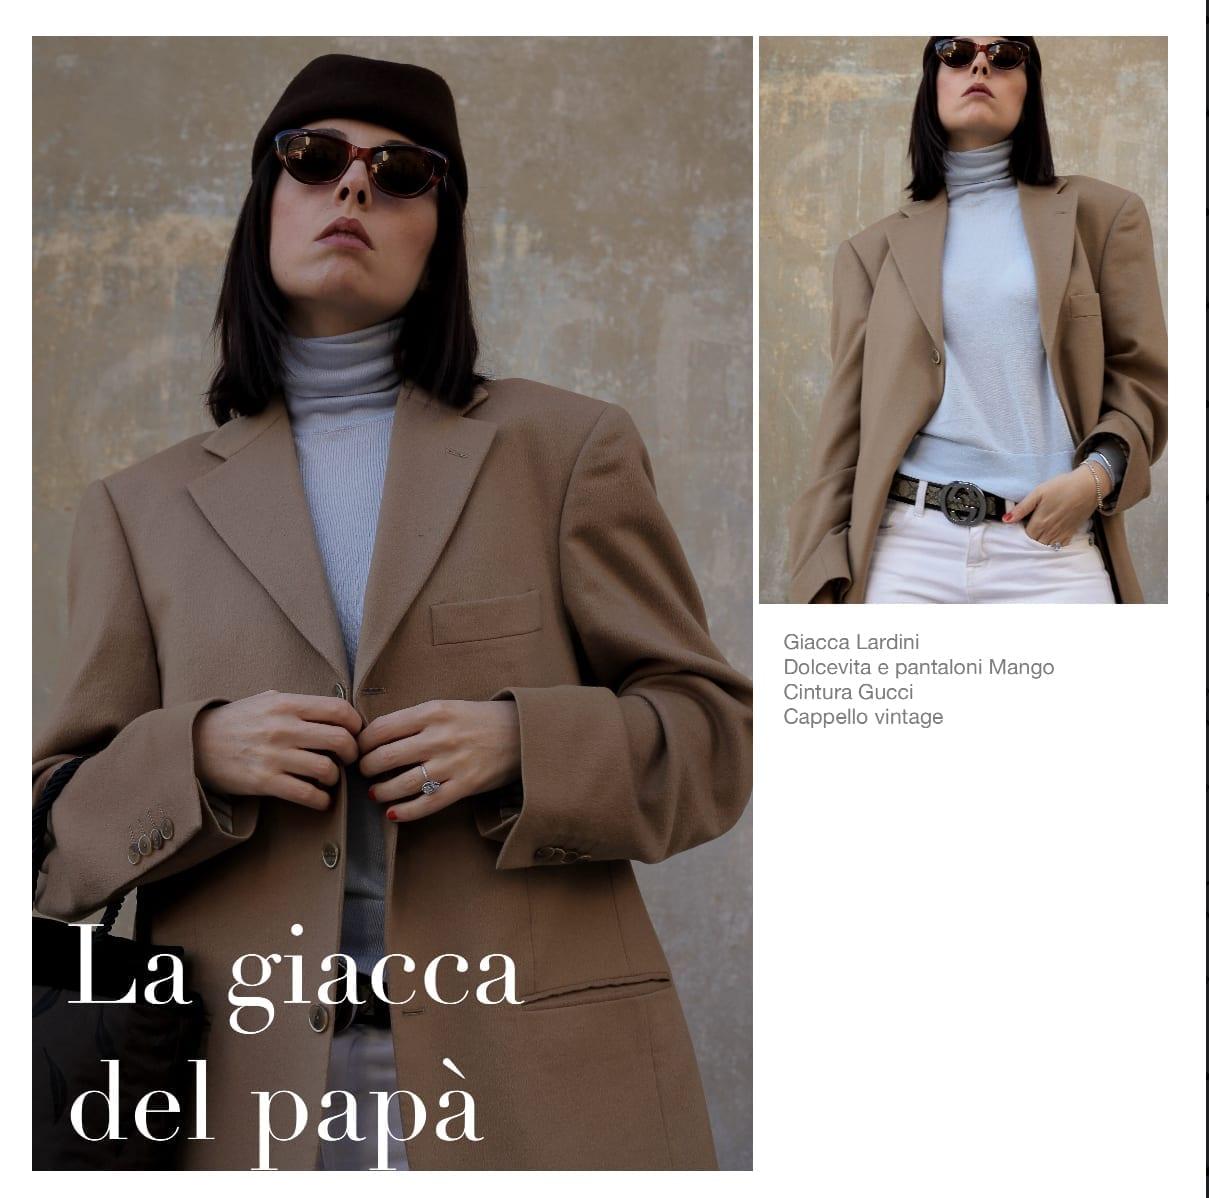 moda 2018, outfit moda 2018, tendenze moda 2018, power suit 2018, come indossare giacca uomo, outfit stile anni 80, blogger moda 2018, blogger moda italiane 2018, fashion blogger italialiane 2018, blogger milano 2018, elisa bellino, cintura gucci vintage